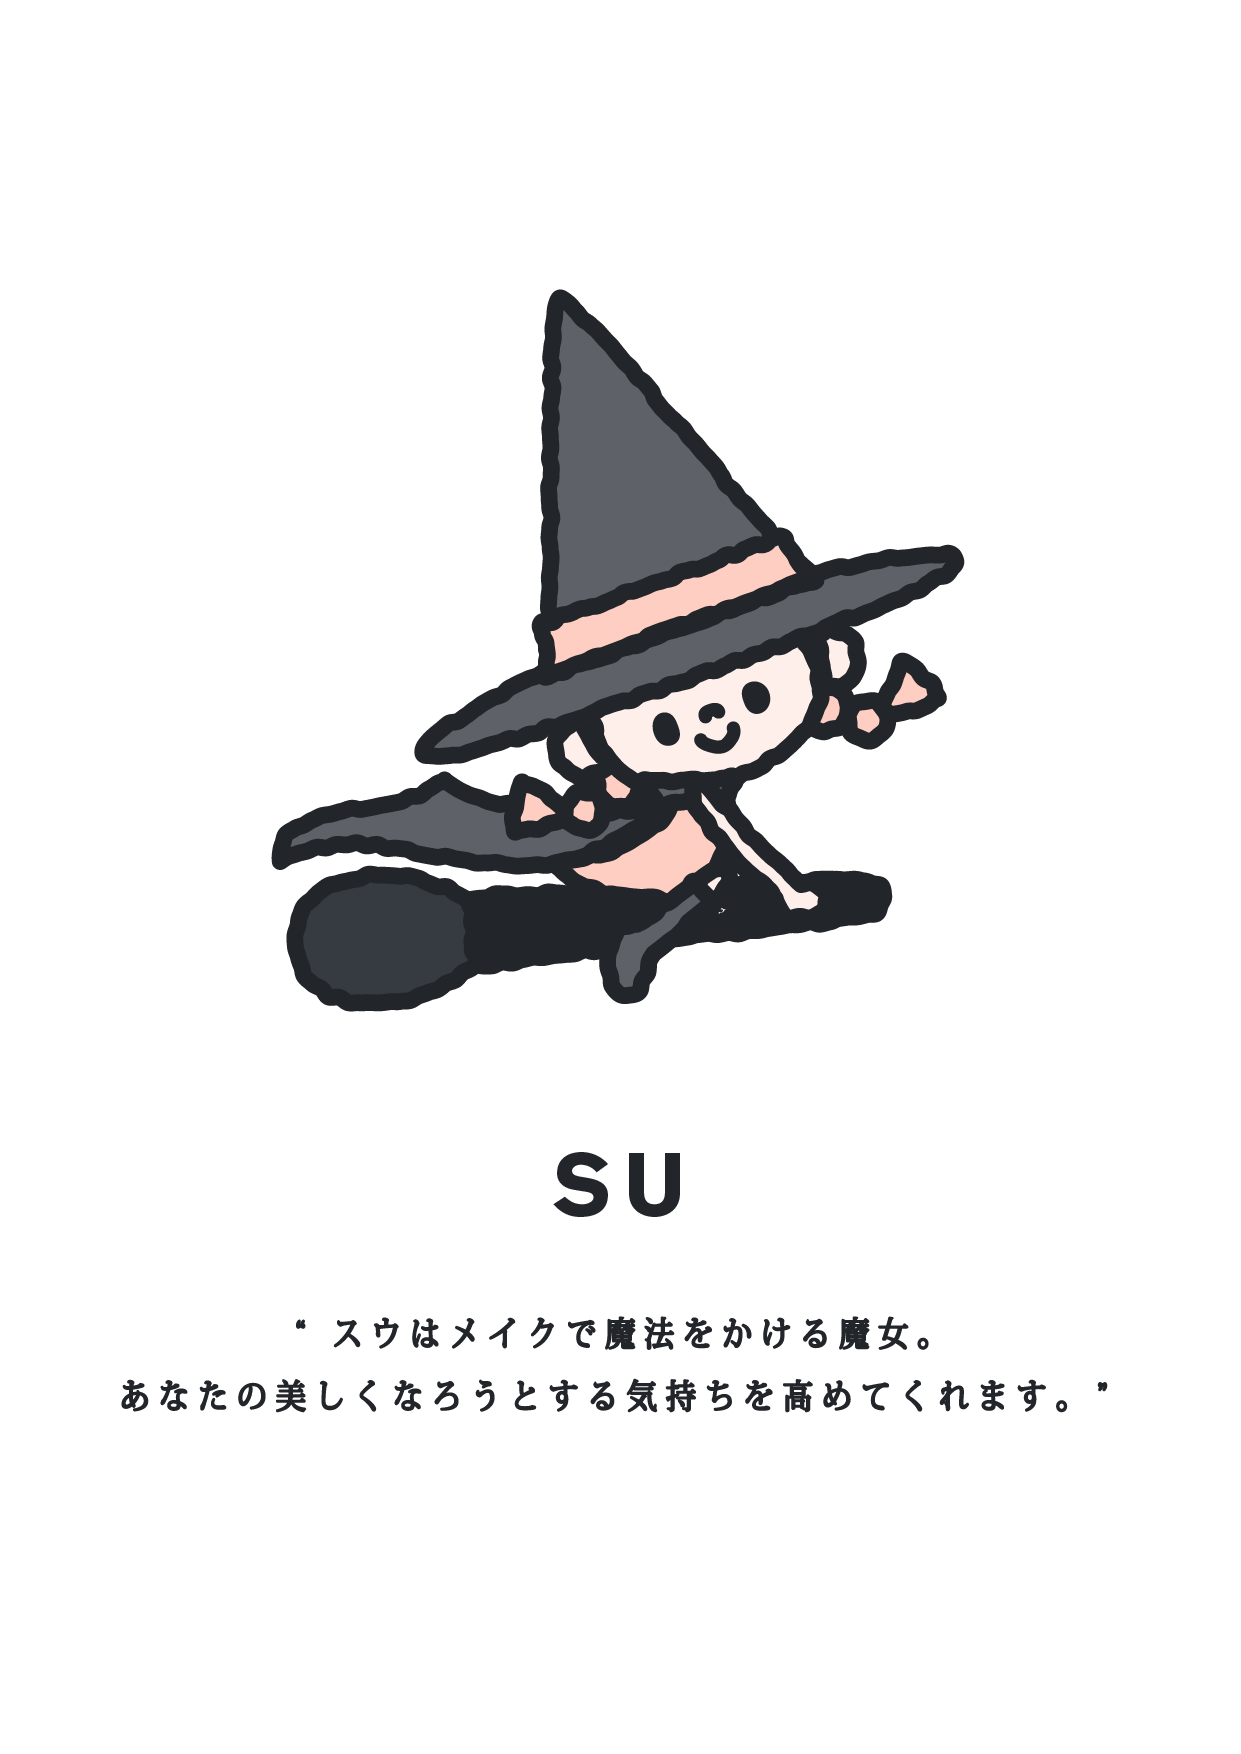 suqqu-present-DATA-05.png